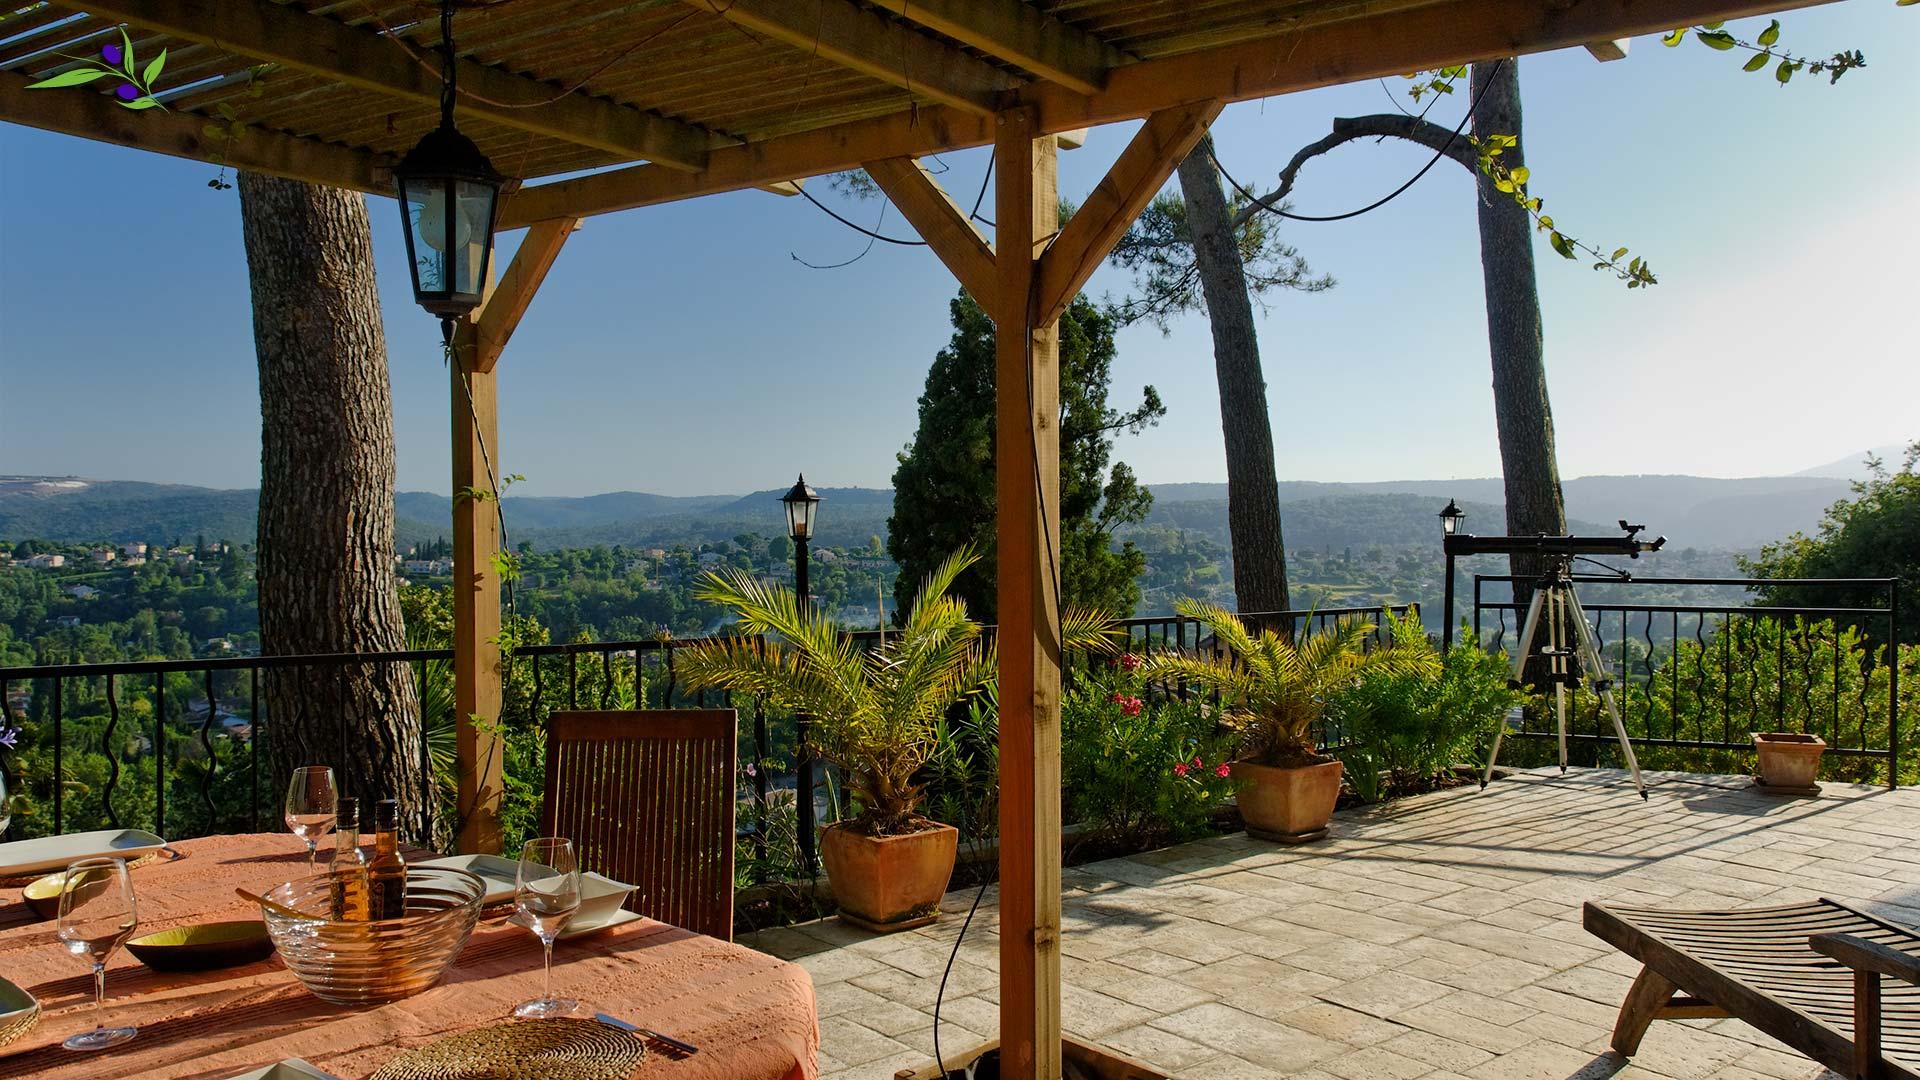 The large terrace has 2 adjustable sun beds.